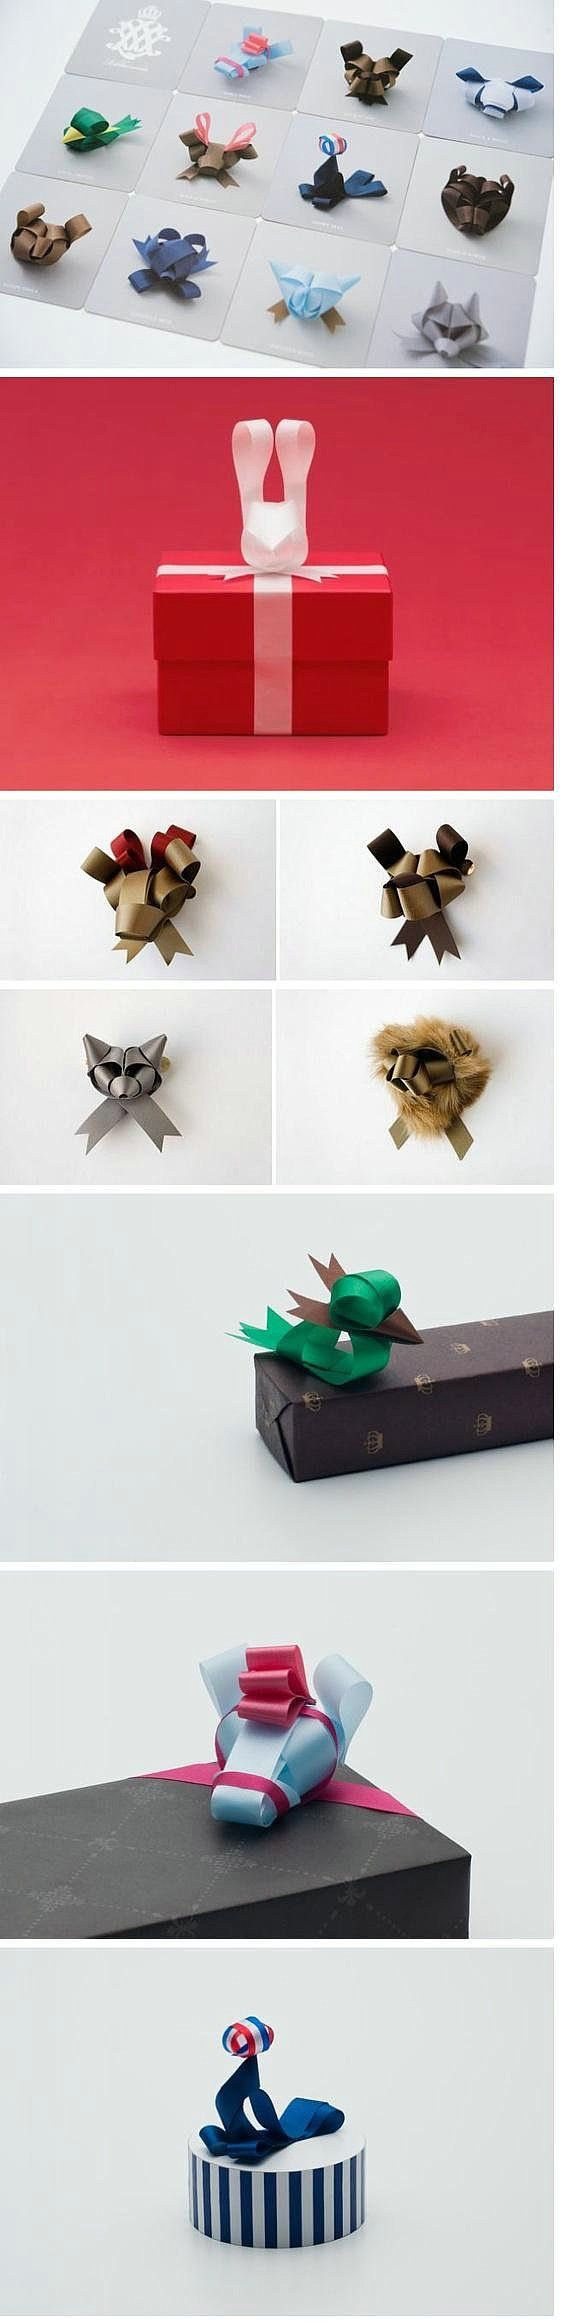 Regalo decorado con cabezas de animales - Gift decorated with animal heads - Deco cadeau têtes animaux